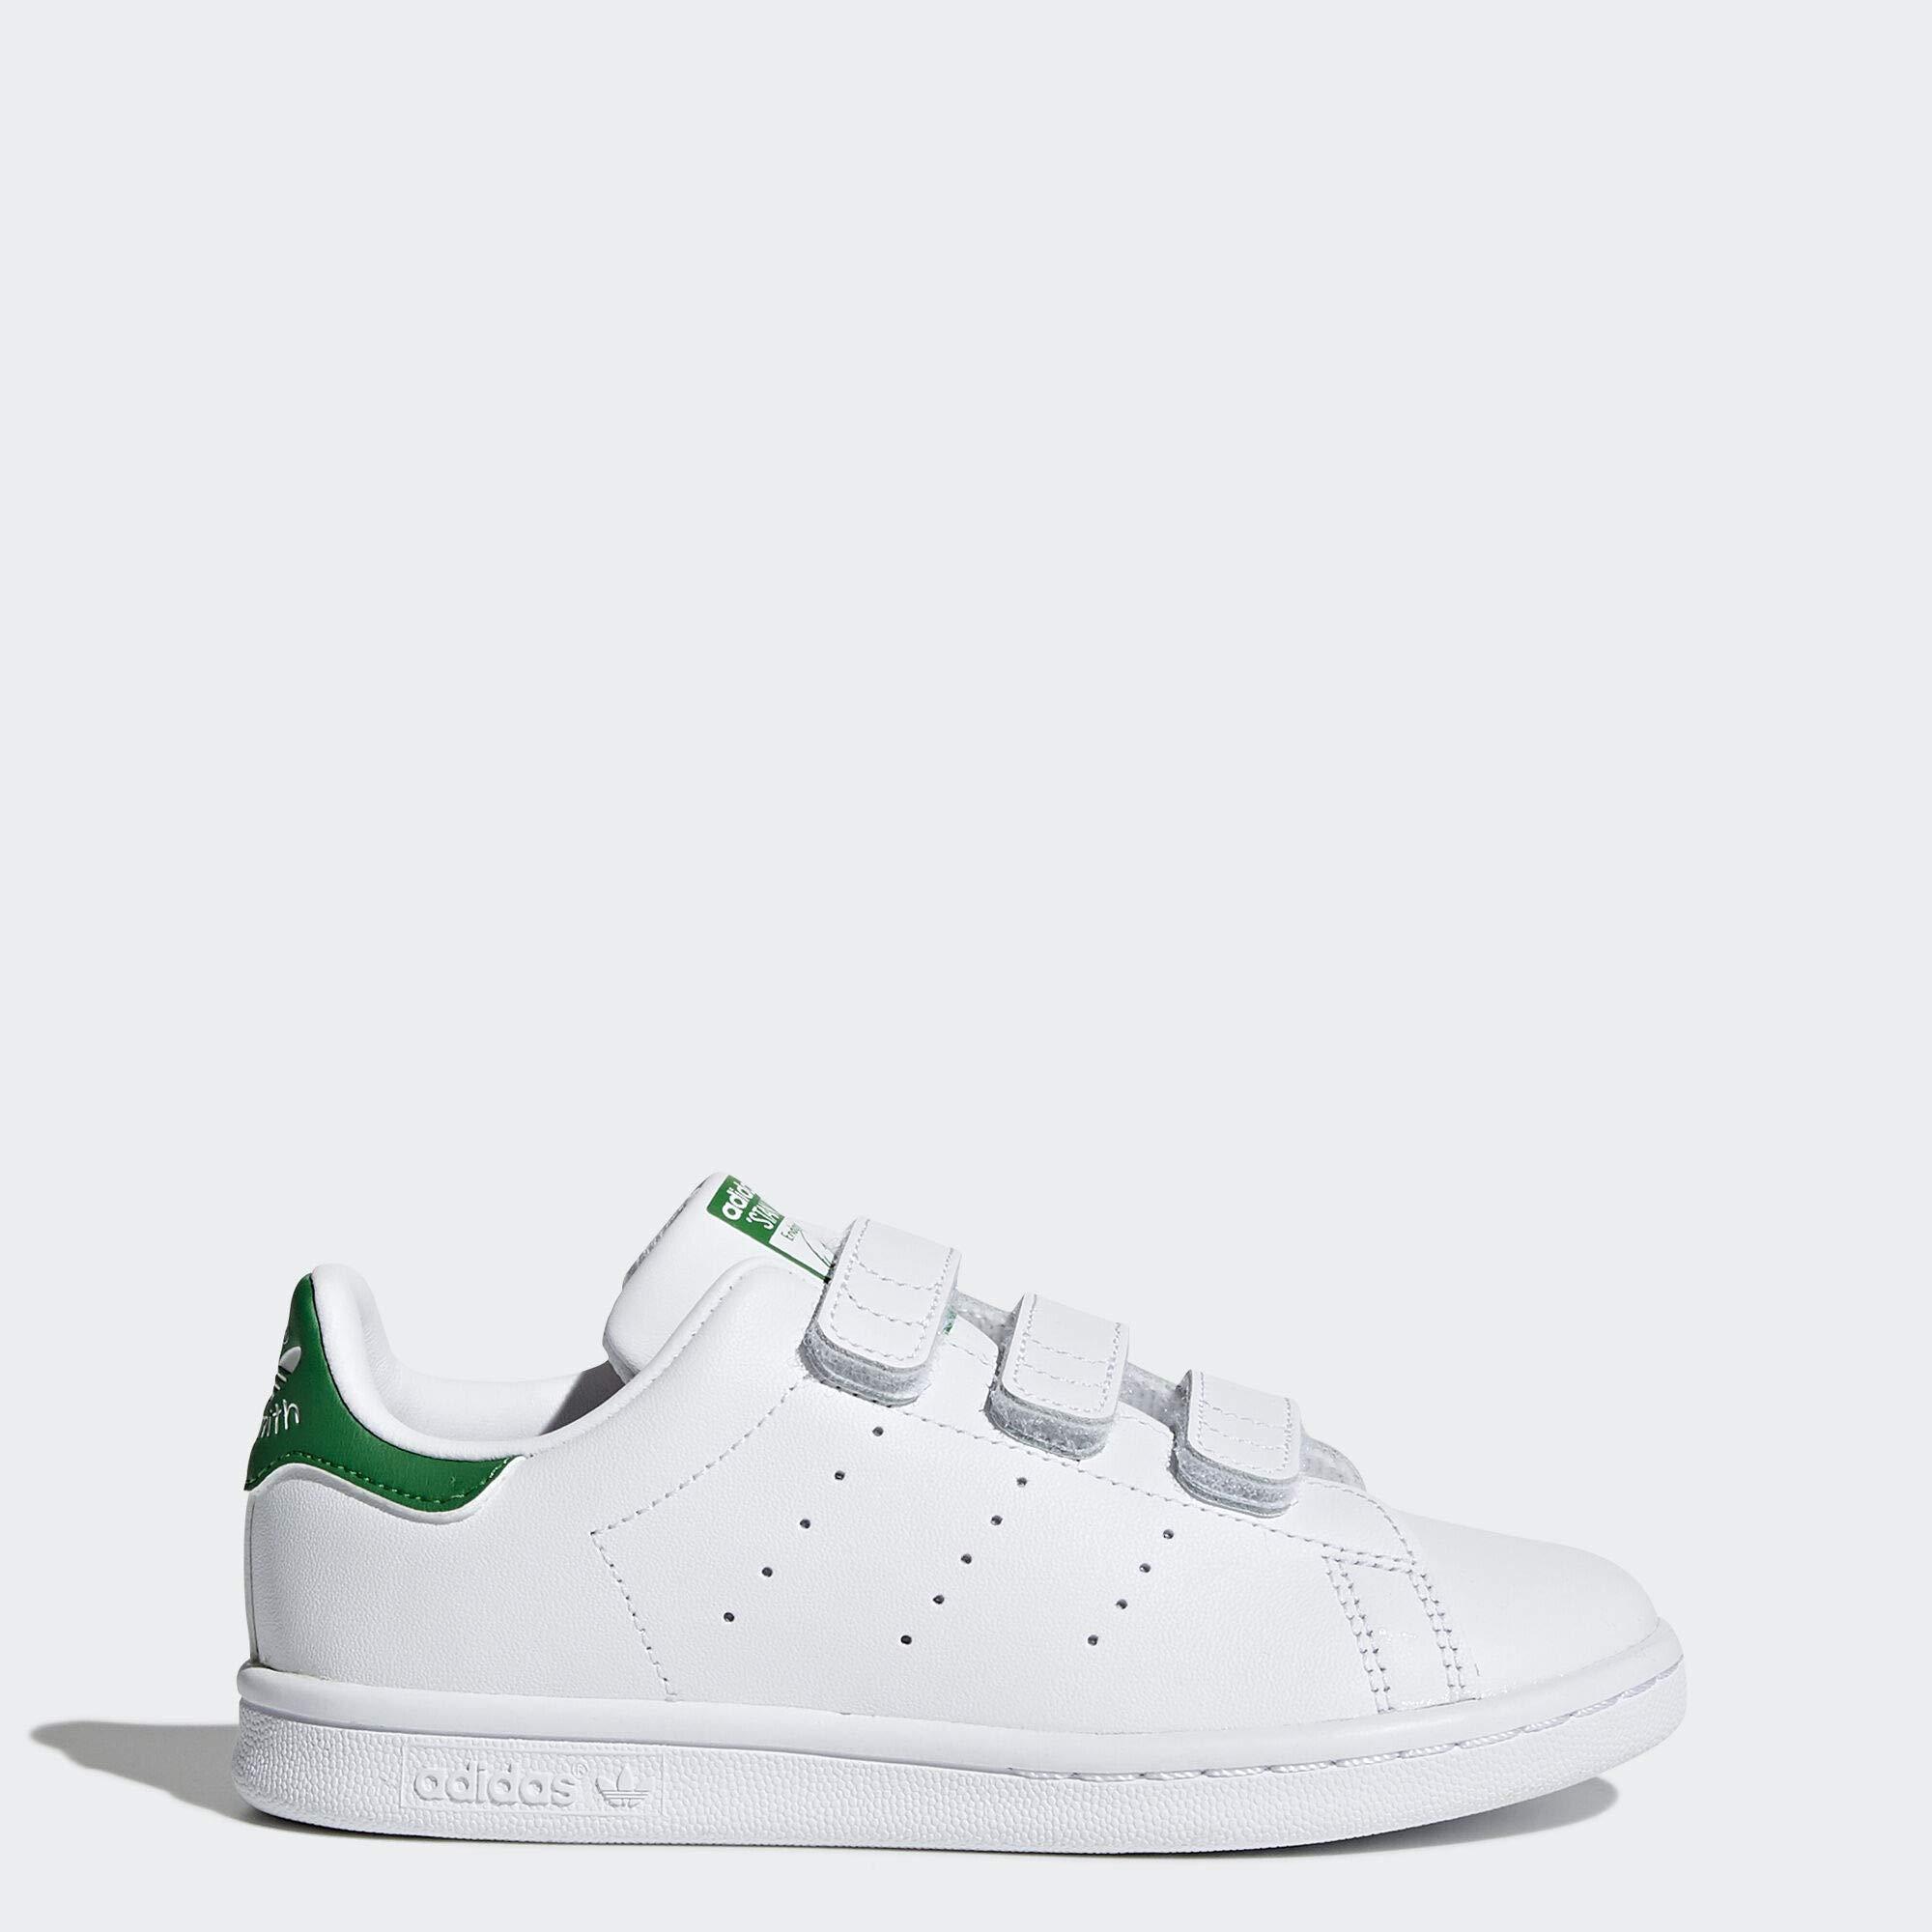 reputable site c4aee 3a359 adidas Originals Stan Smith Cloudfoam Sneaker, Footwear White/Green, 12 M  US Little Kid